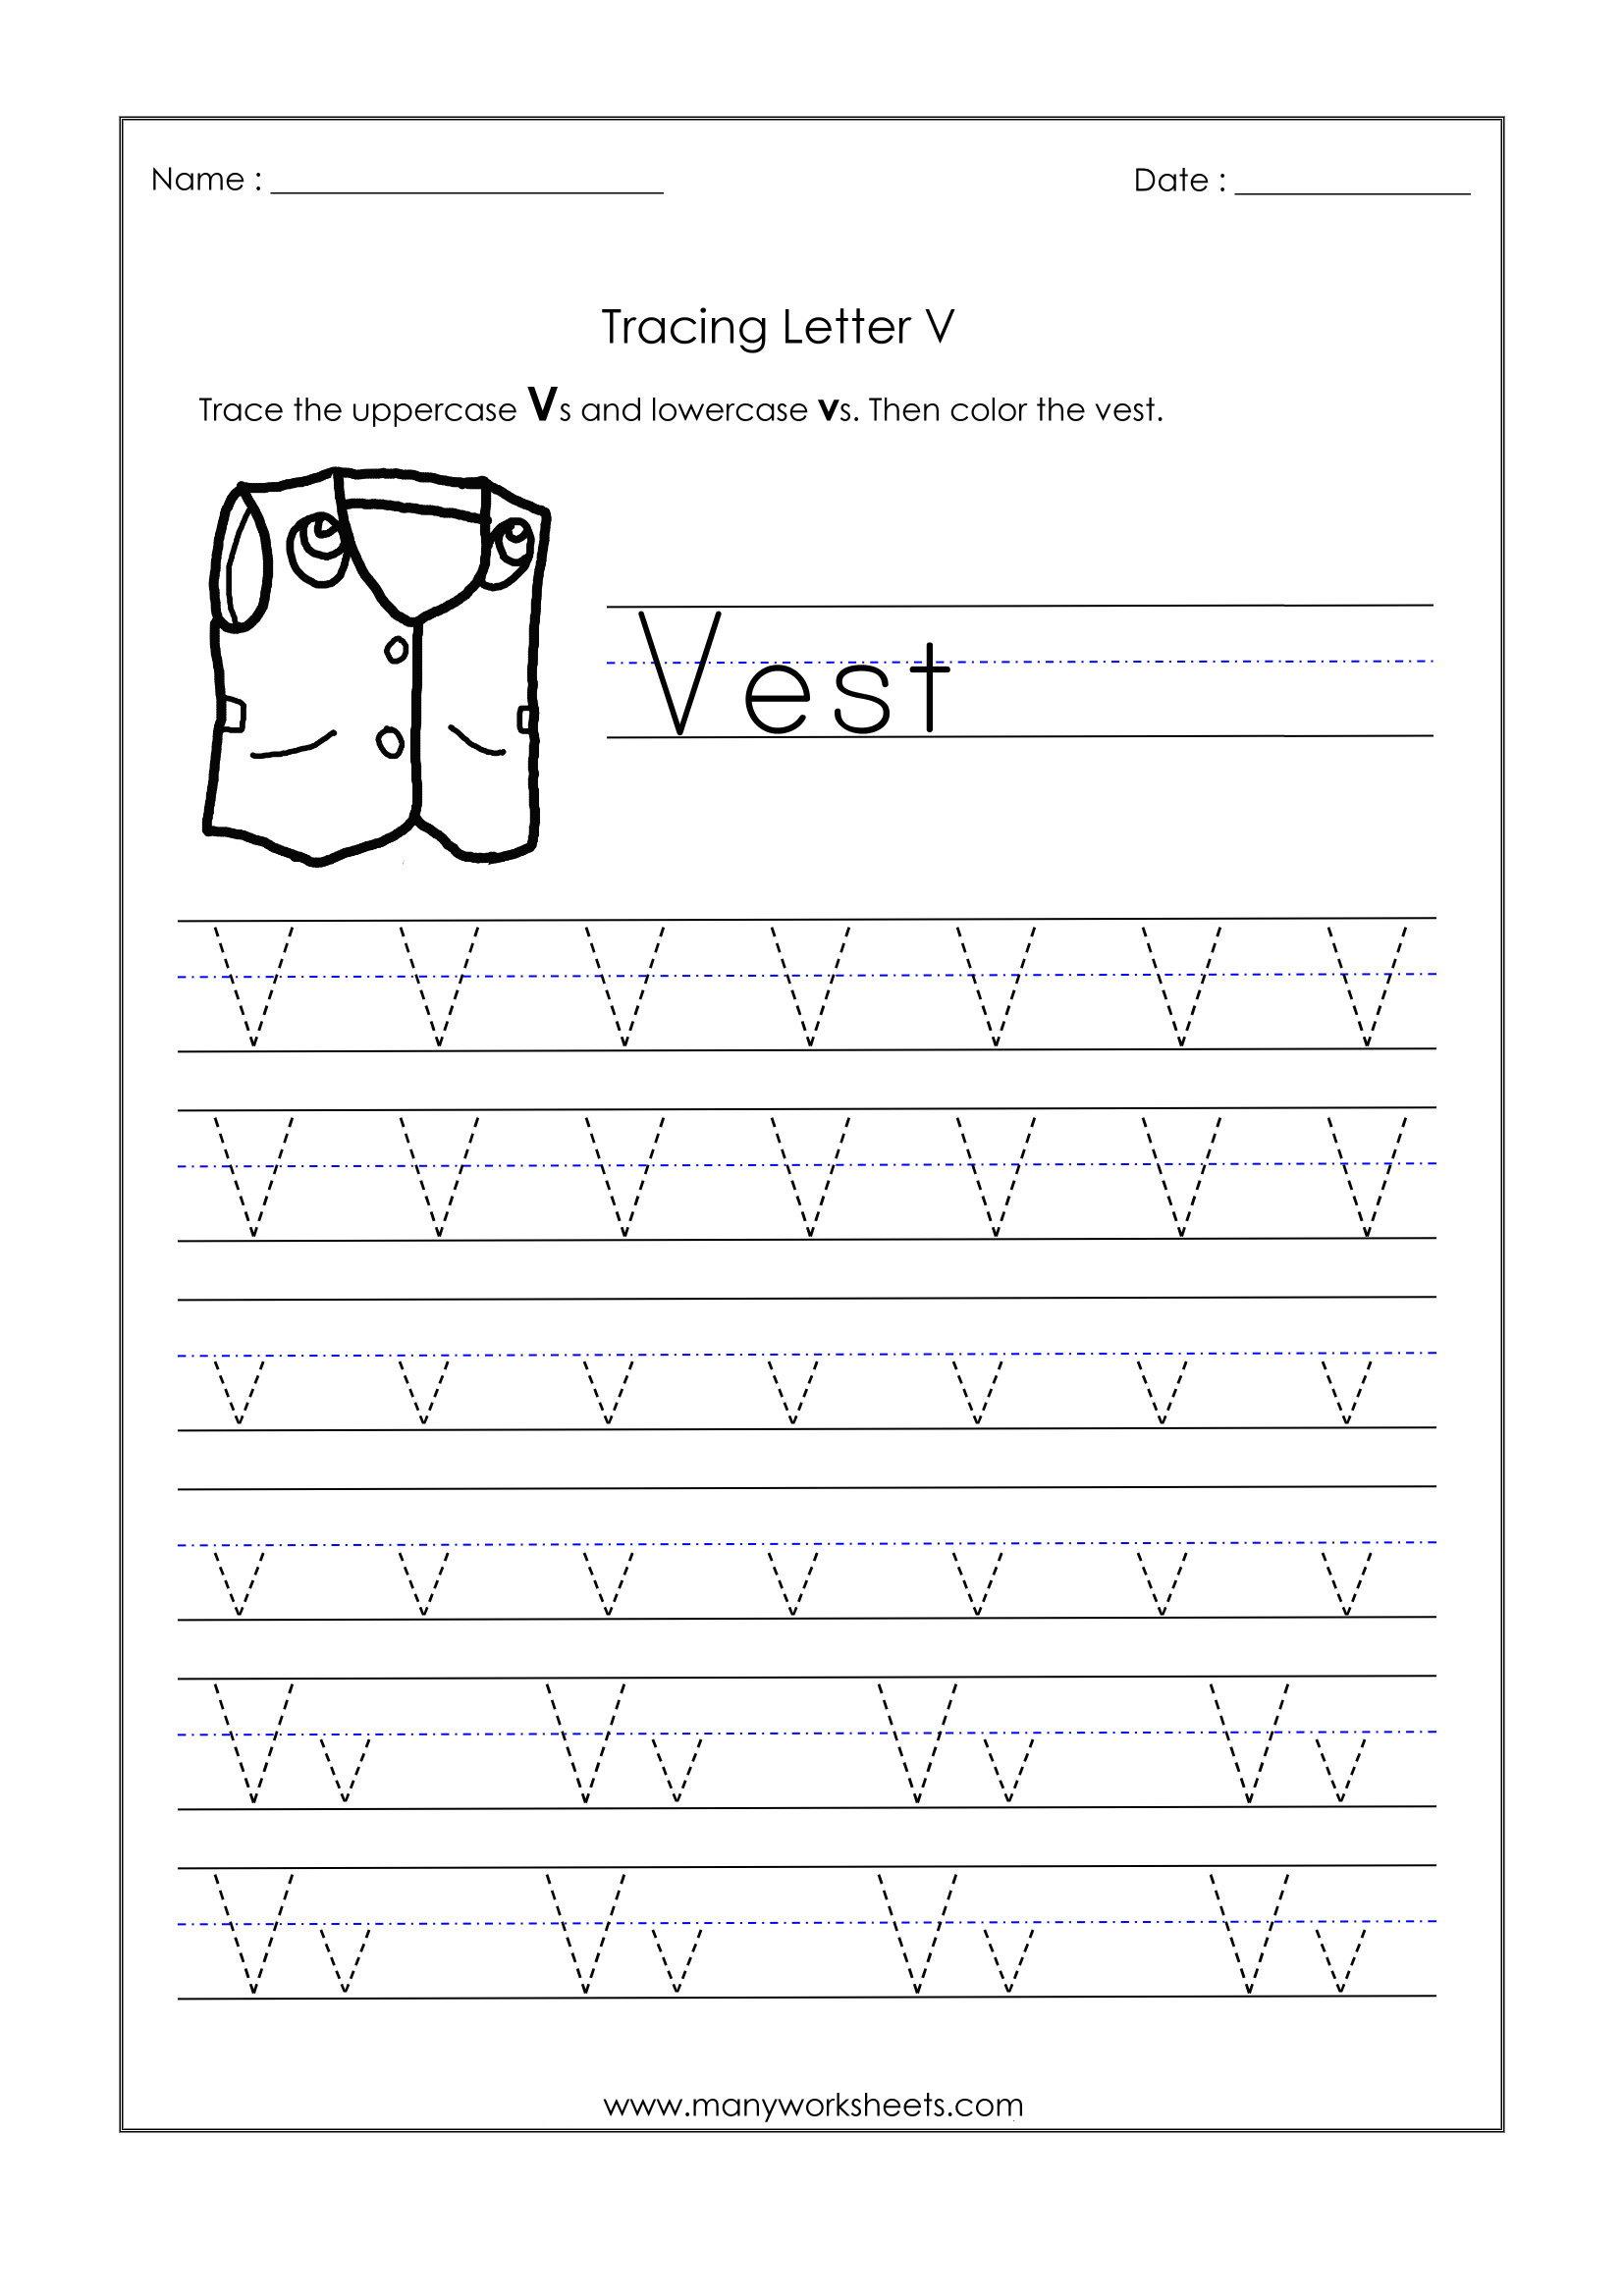 Letter V Worksheets For Kindergarten – Trace Dotted Letters inside Letter V Tracing Worksheets For Preschool